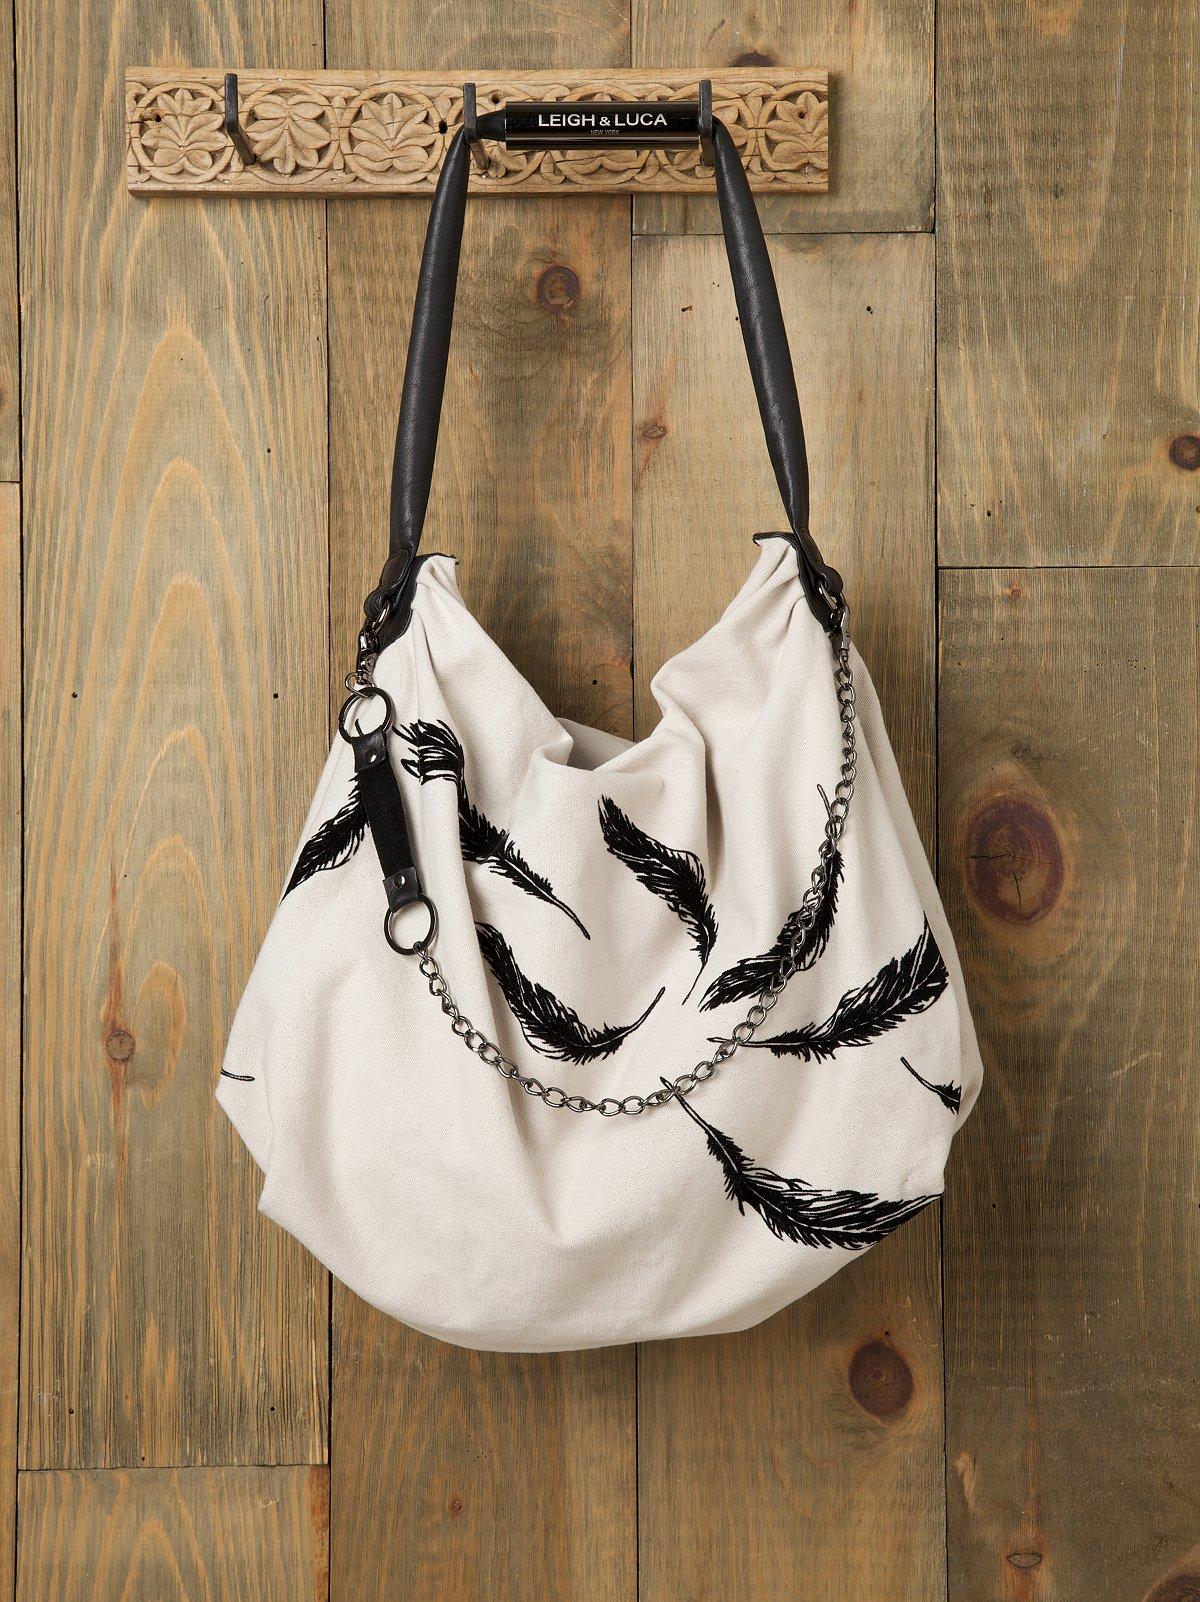 Leigh Feather Bag